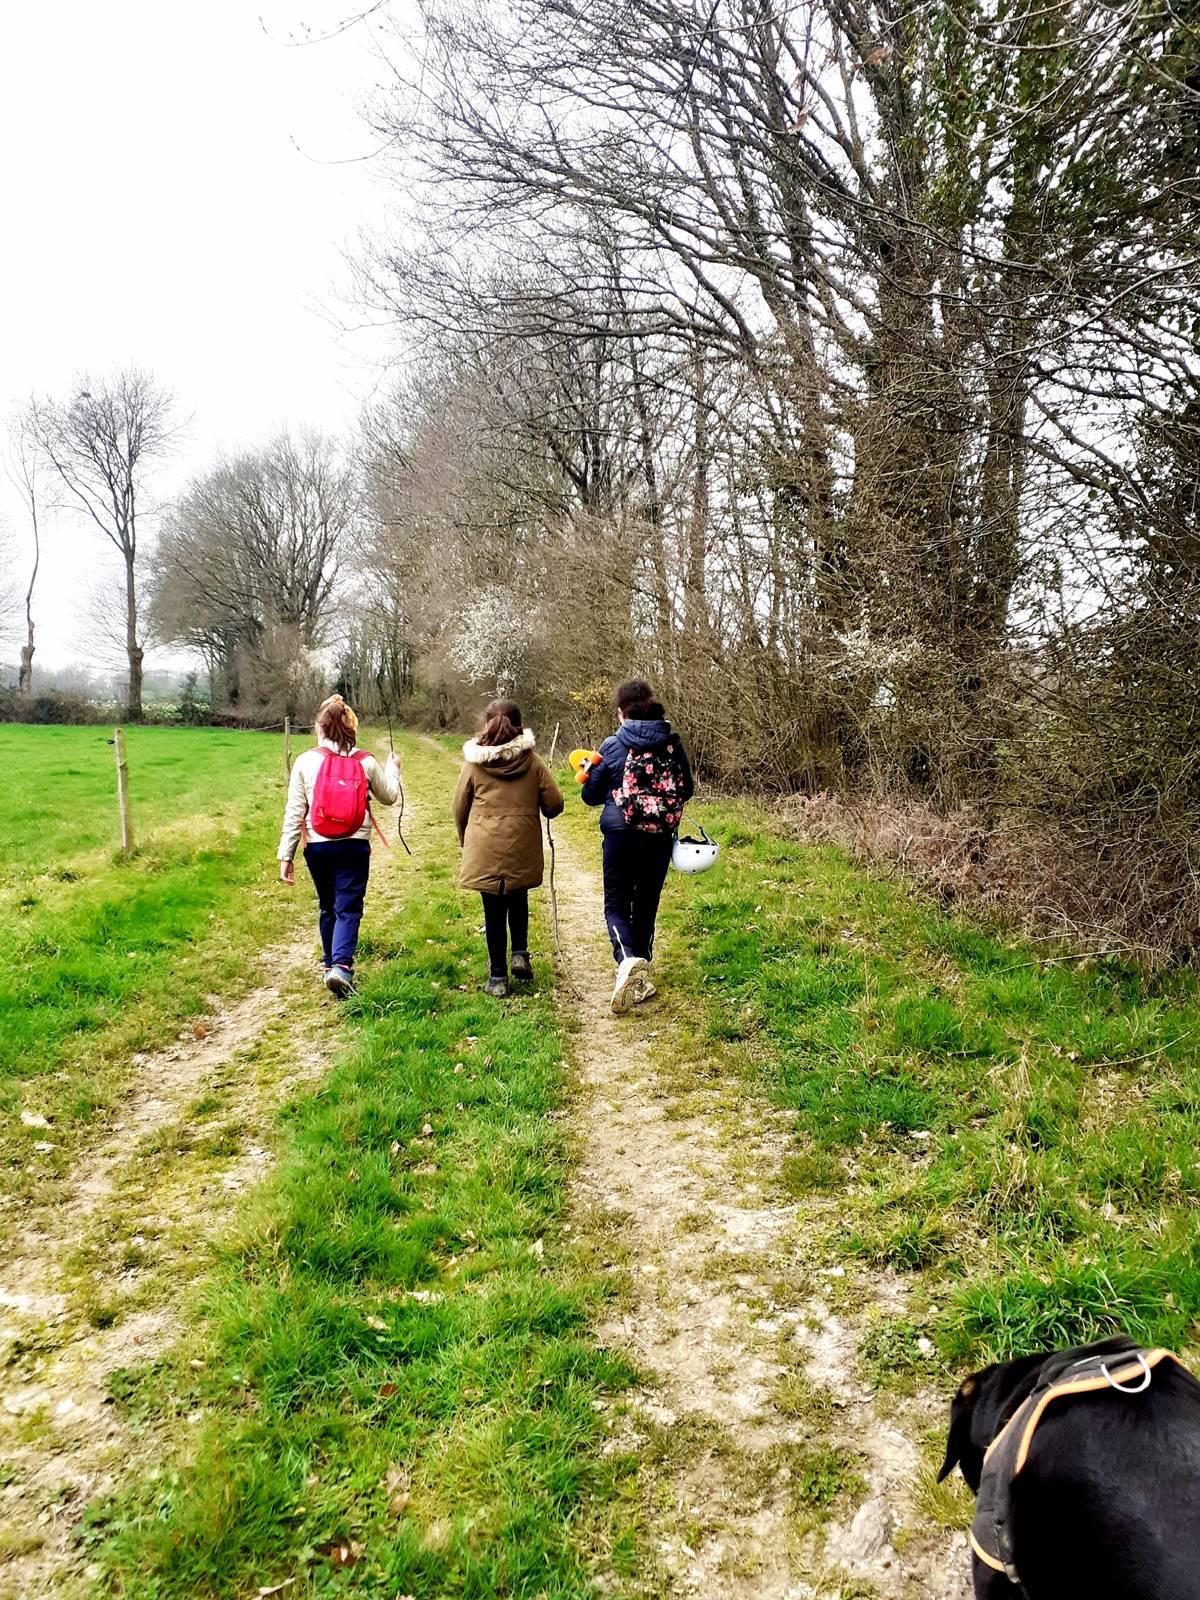 15km randonnee chateaubriant20210321 175816